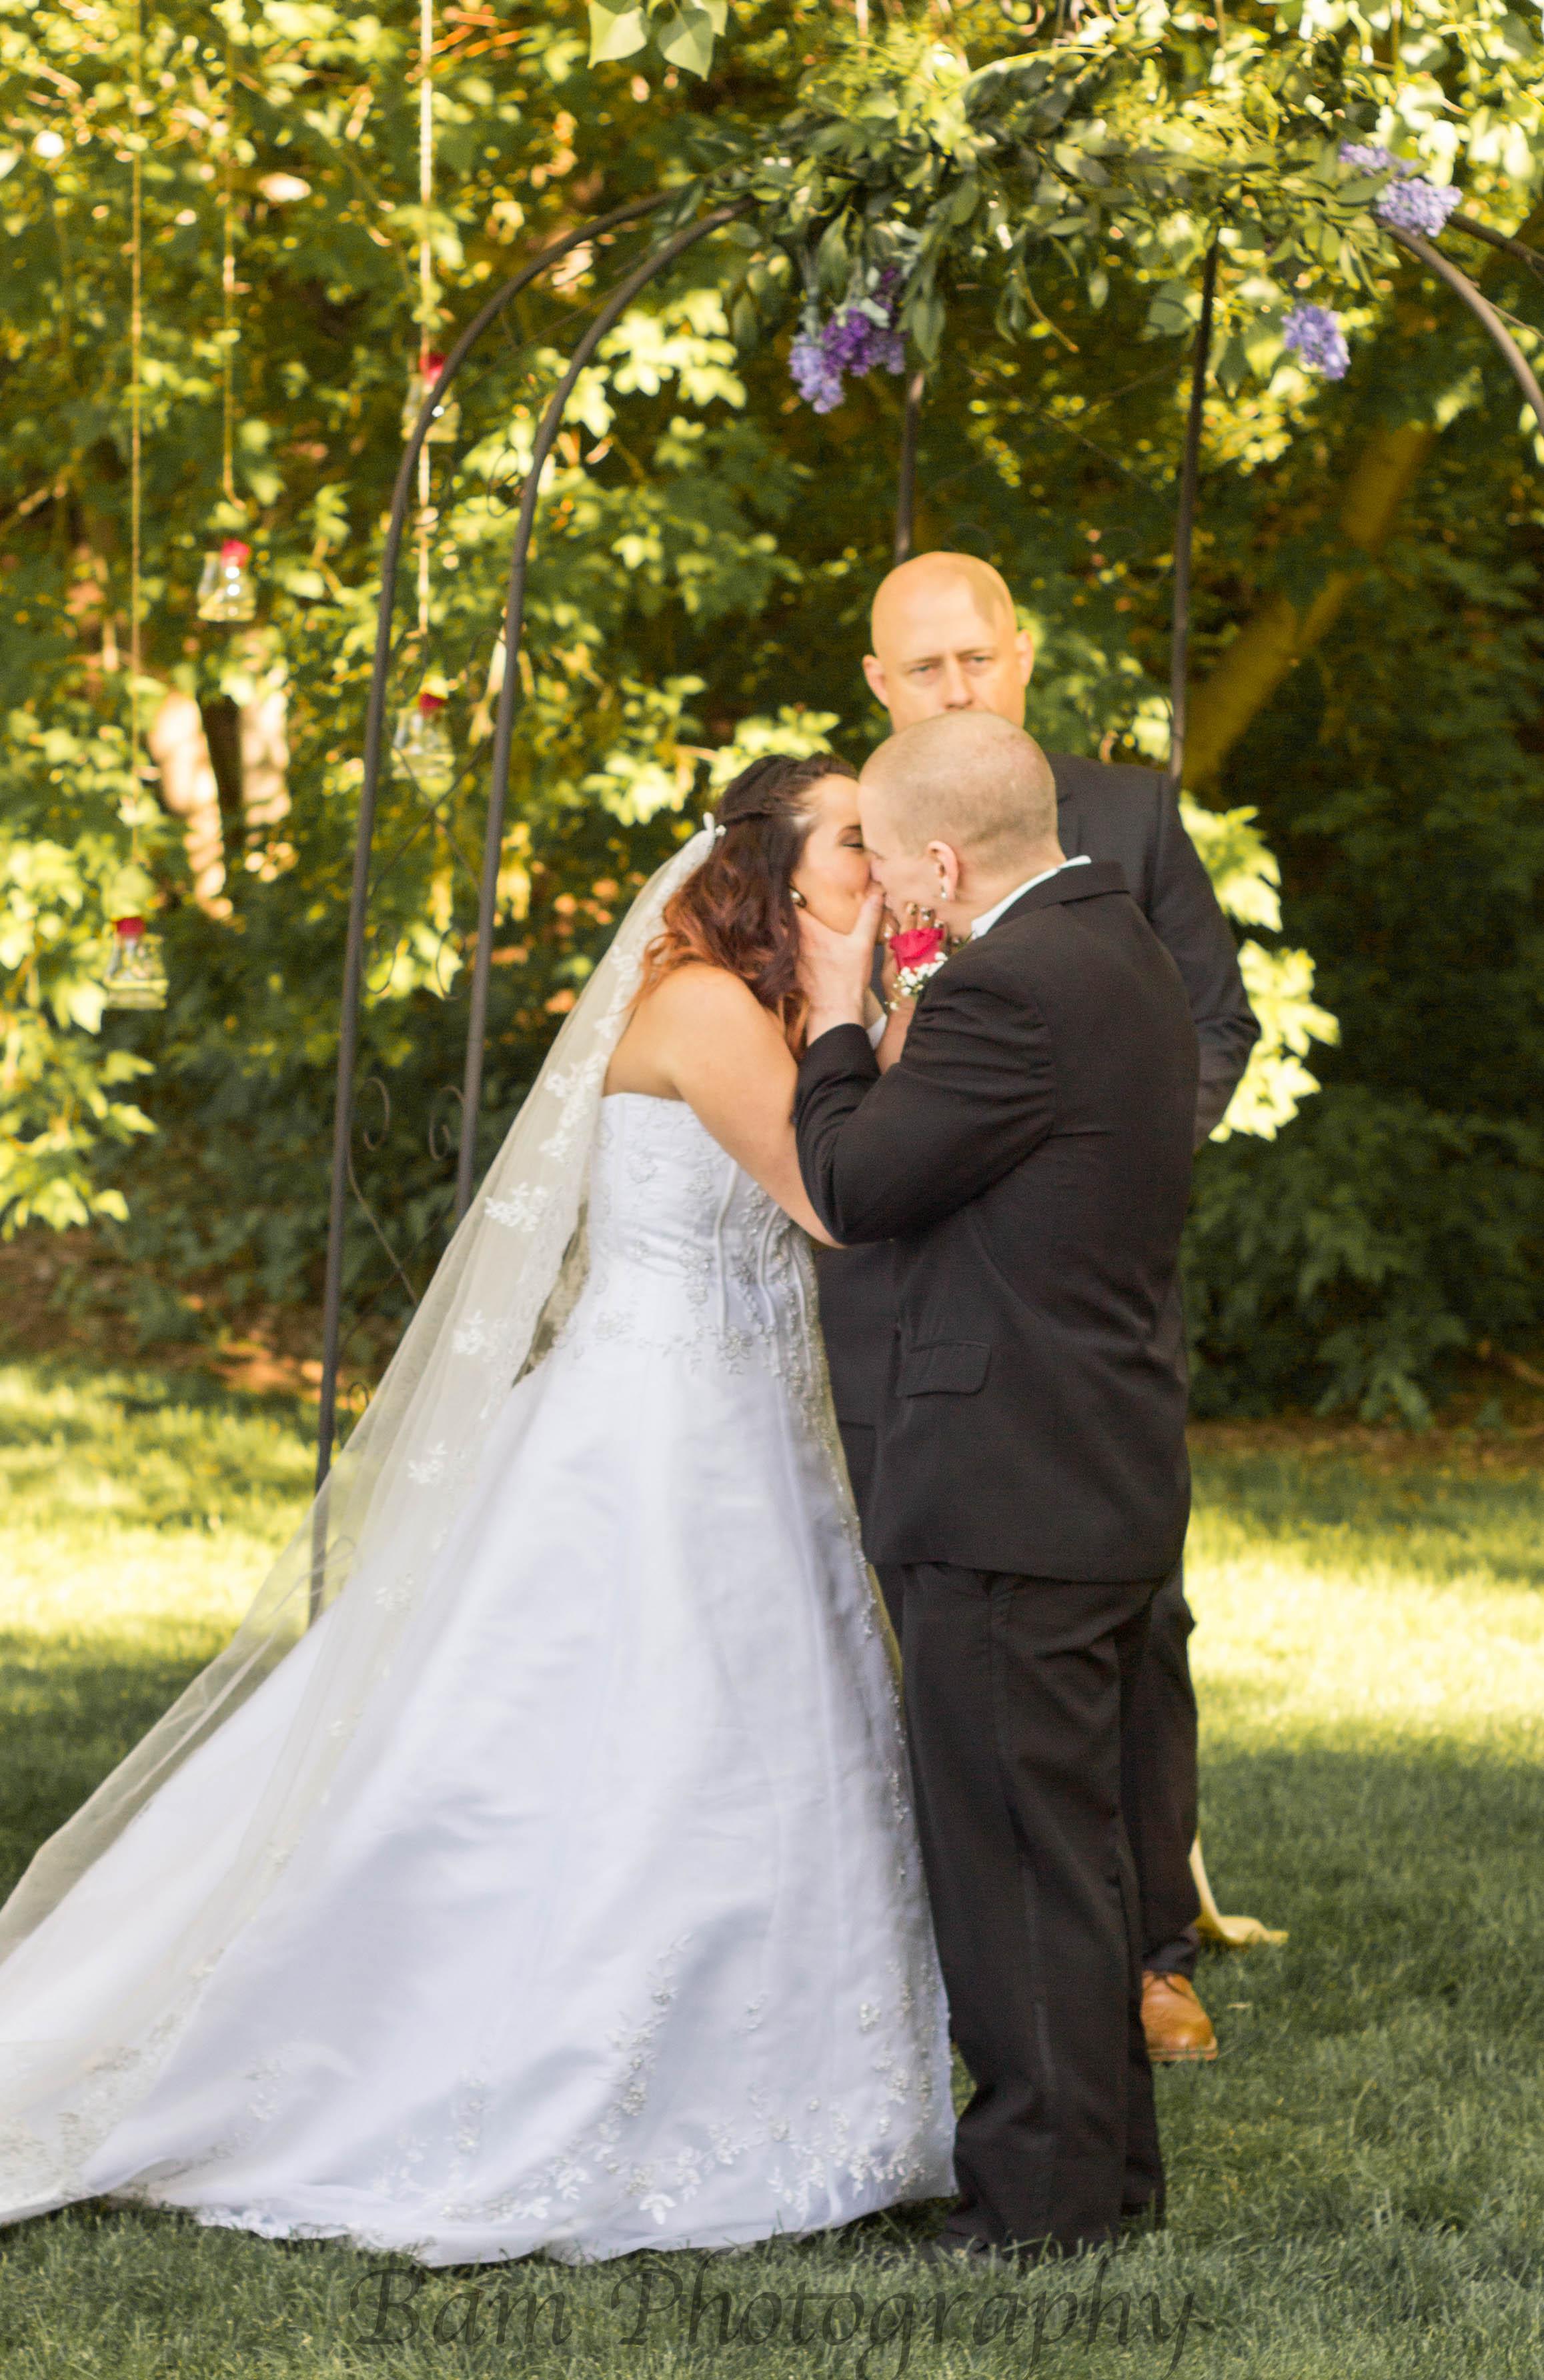 Married Kiss!